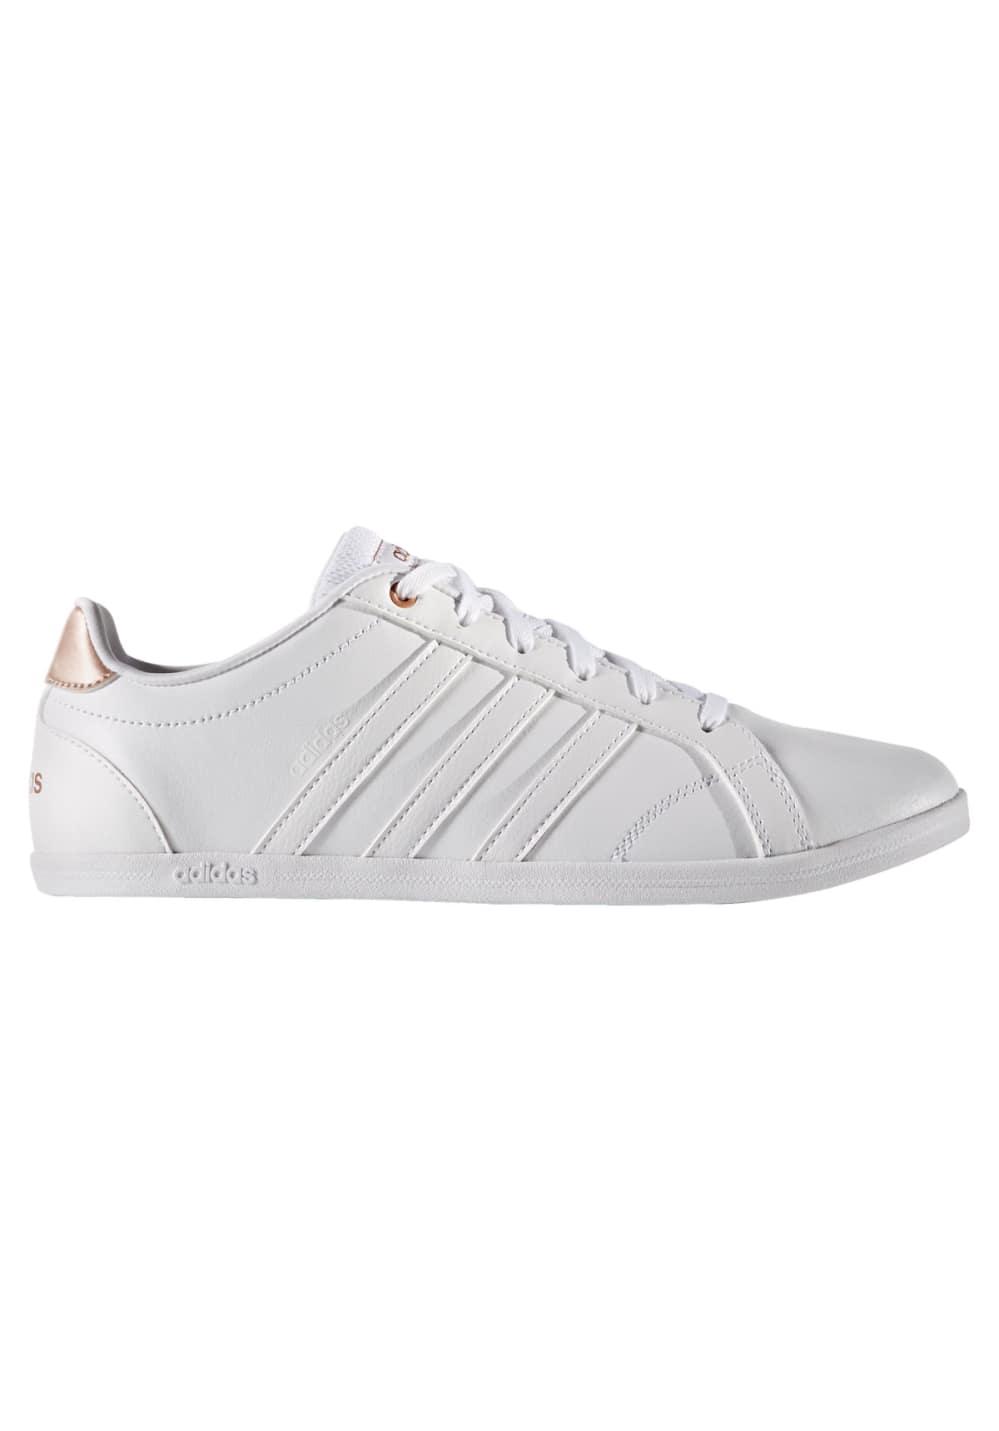 Chaussure Adidas|Asics